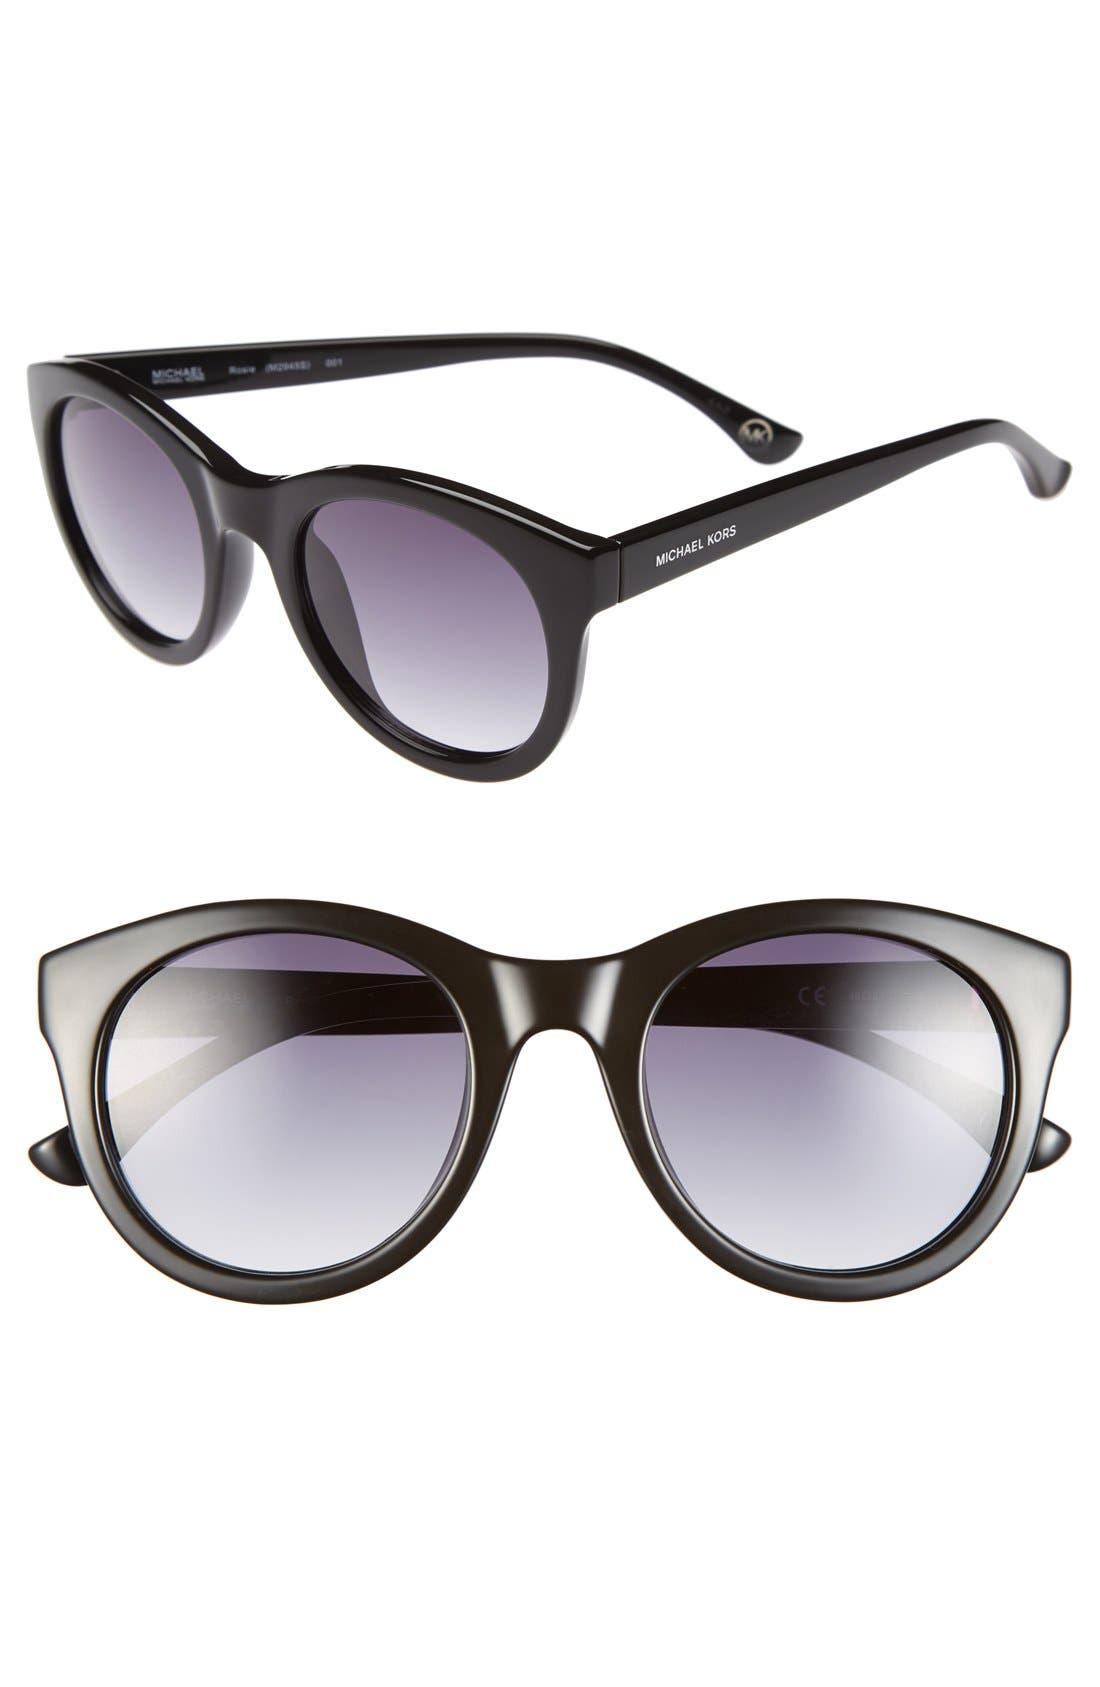 MICHAEL MICHAEL KORS 'Rosie' 49mm Sunglasses, Main, color, 001